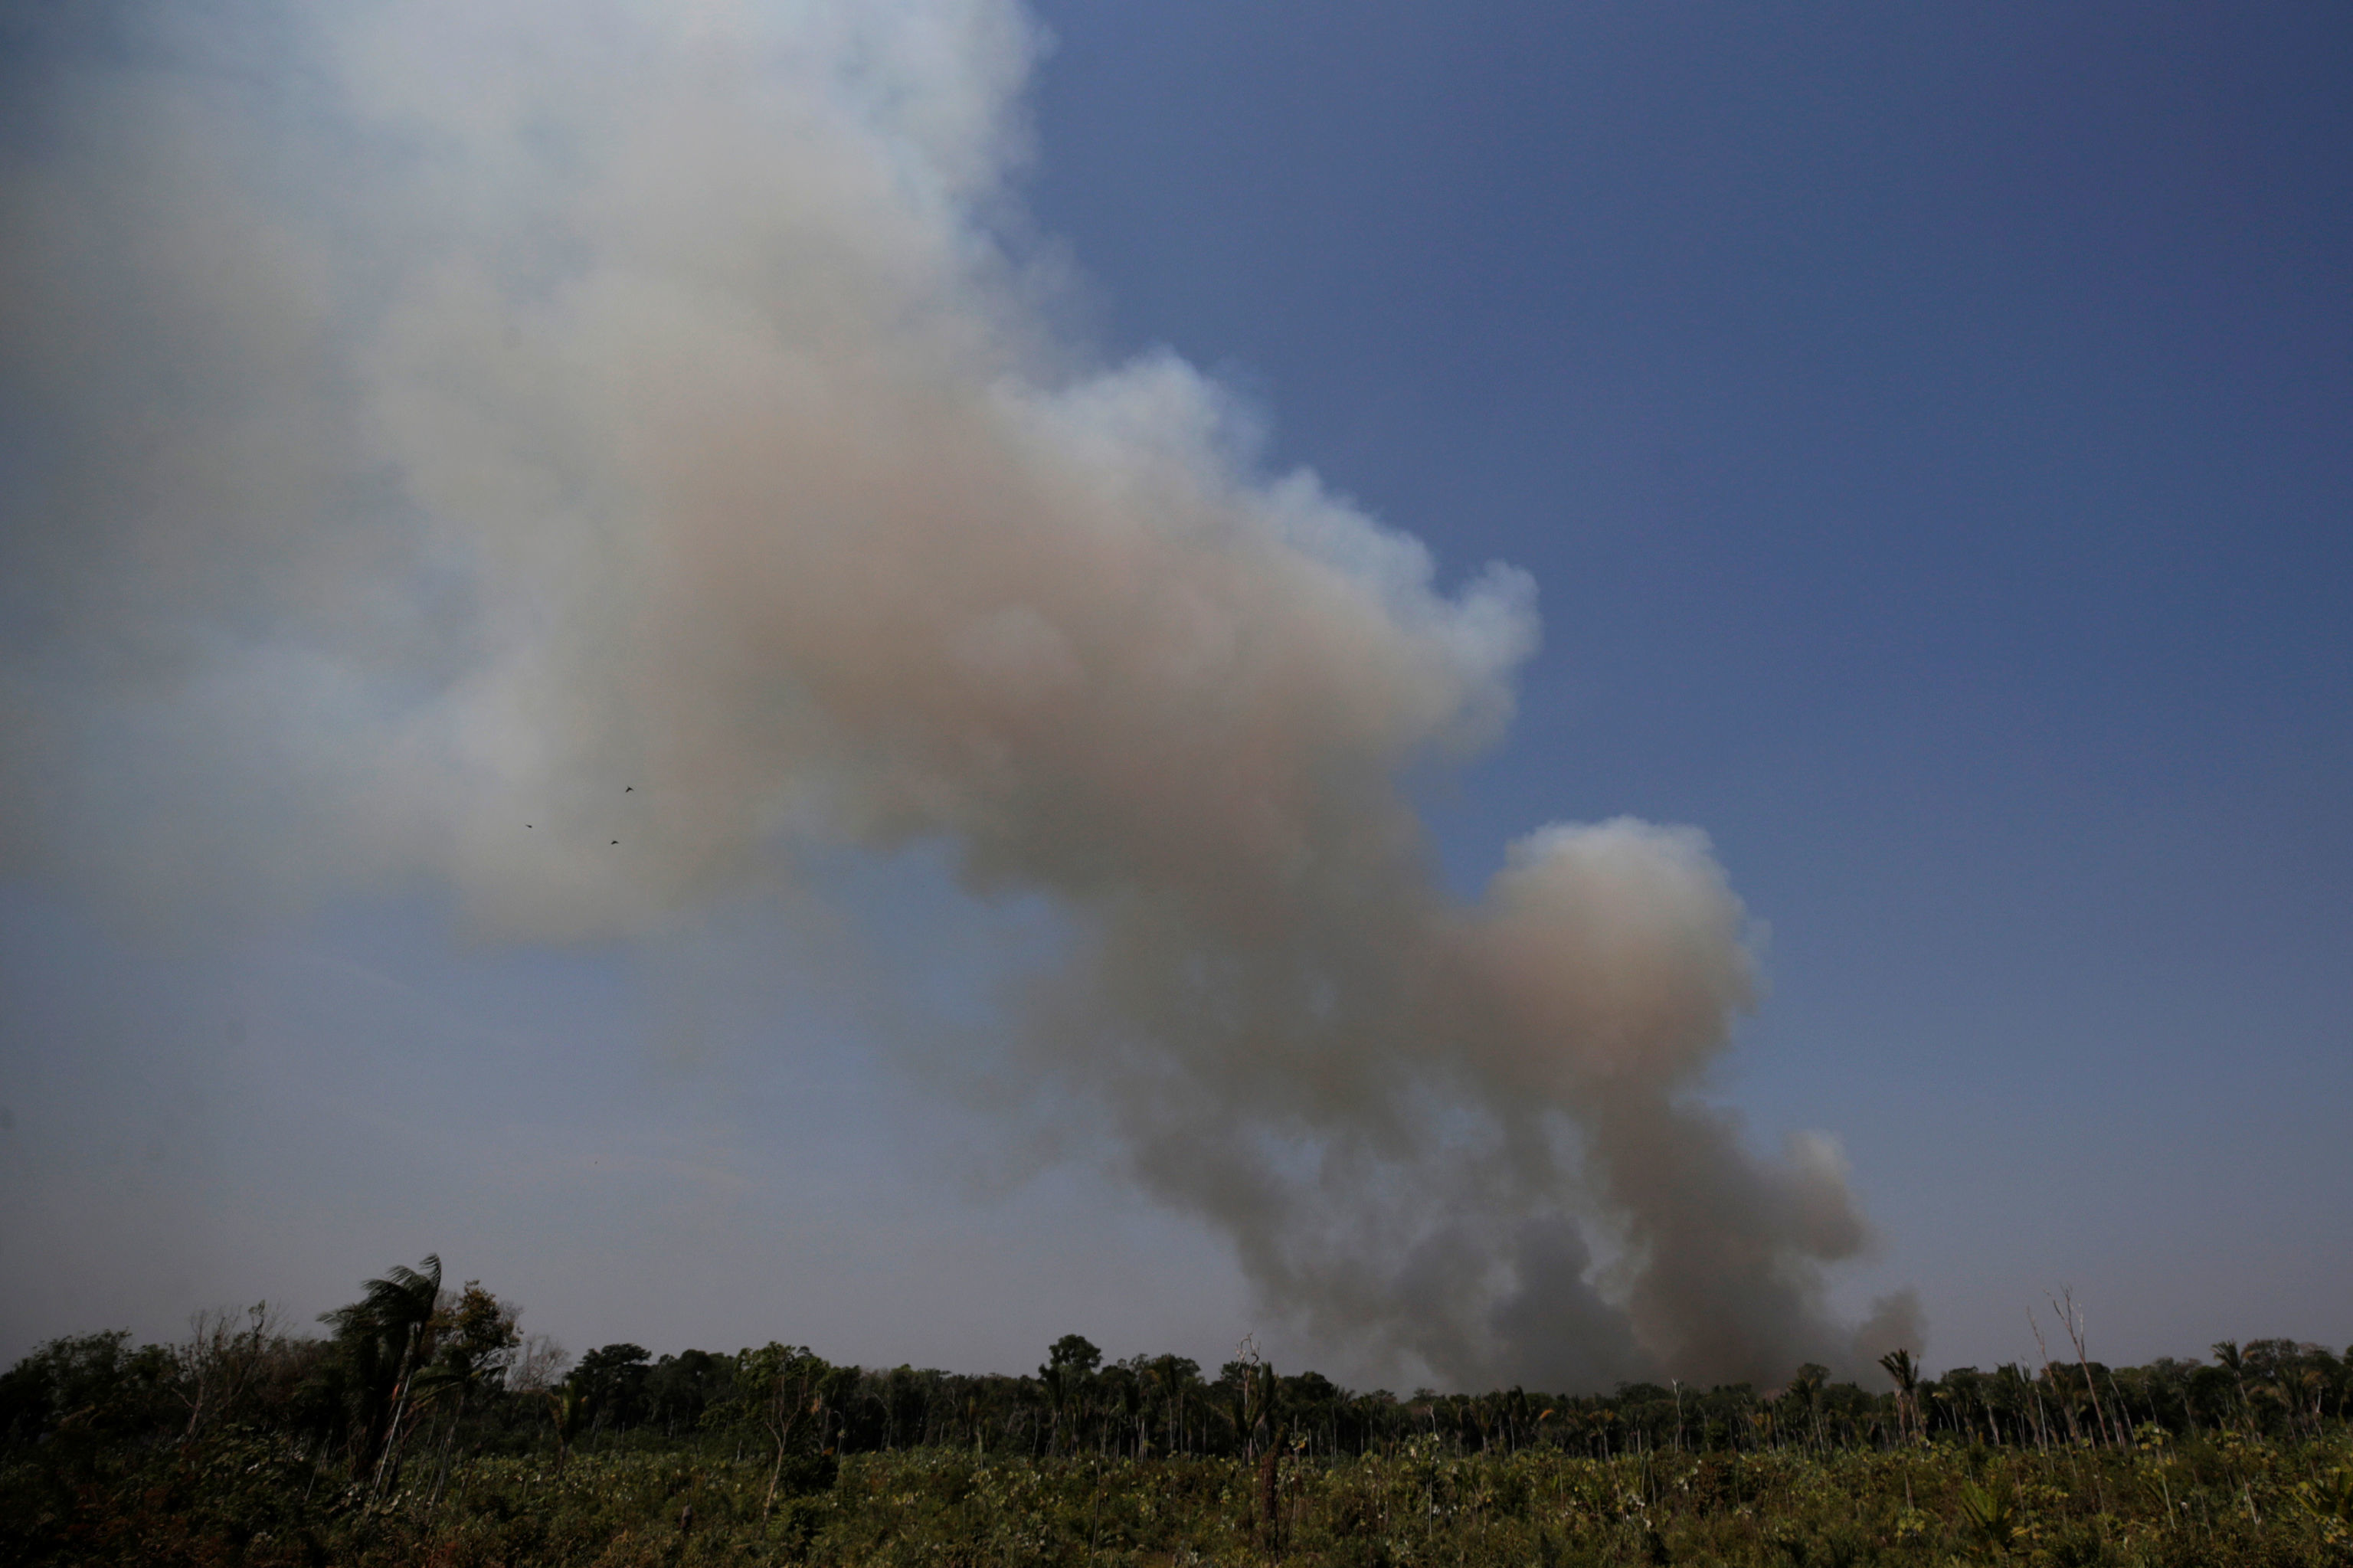 Foco de incêndio na Floresta Amazônica, Humaitá, Brasil, 14 de agosto de 2019